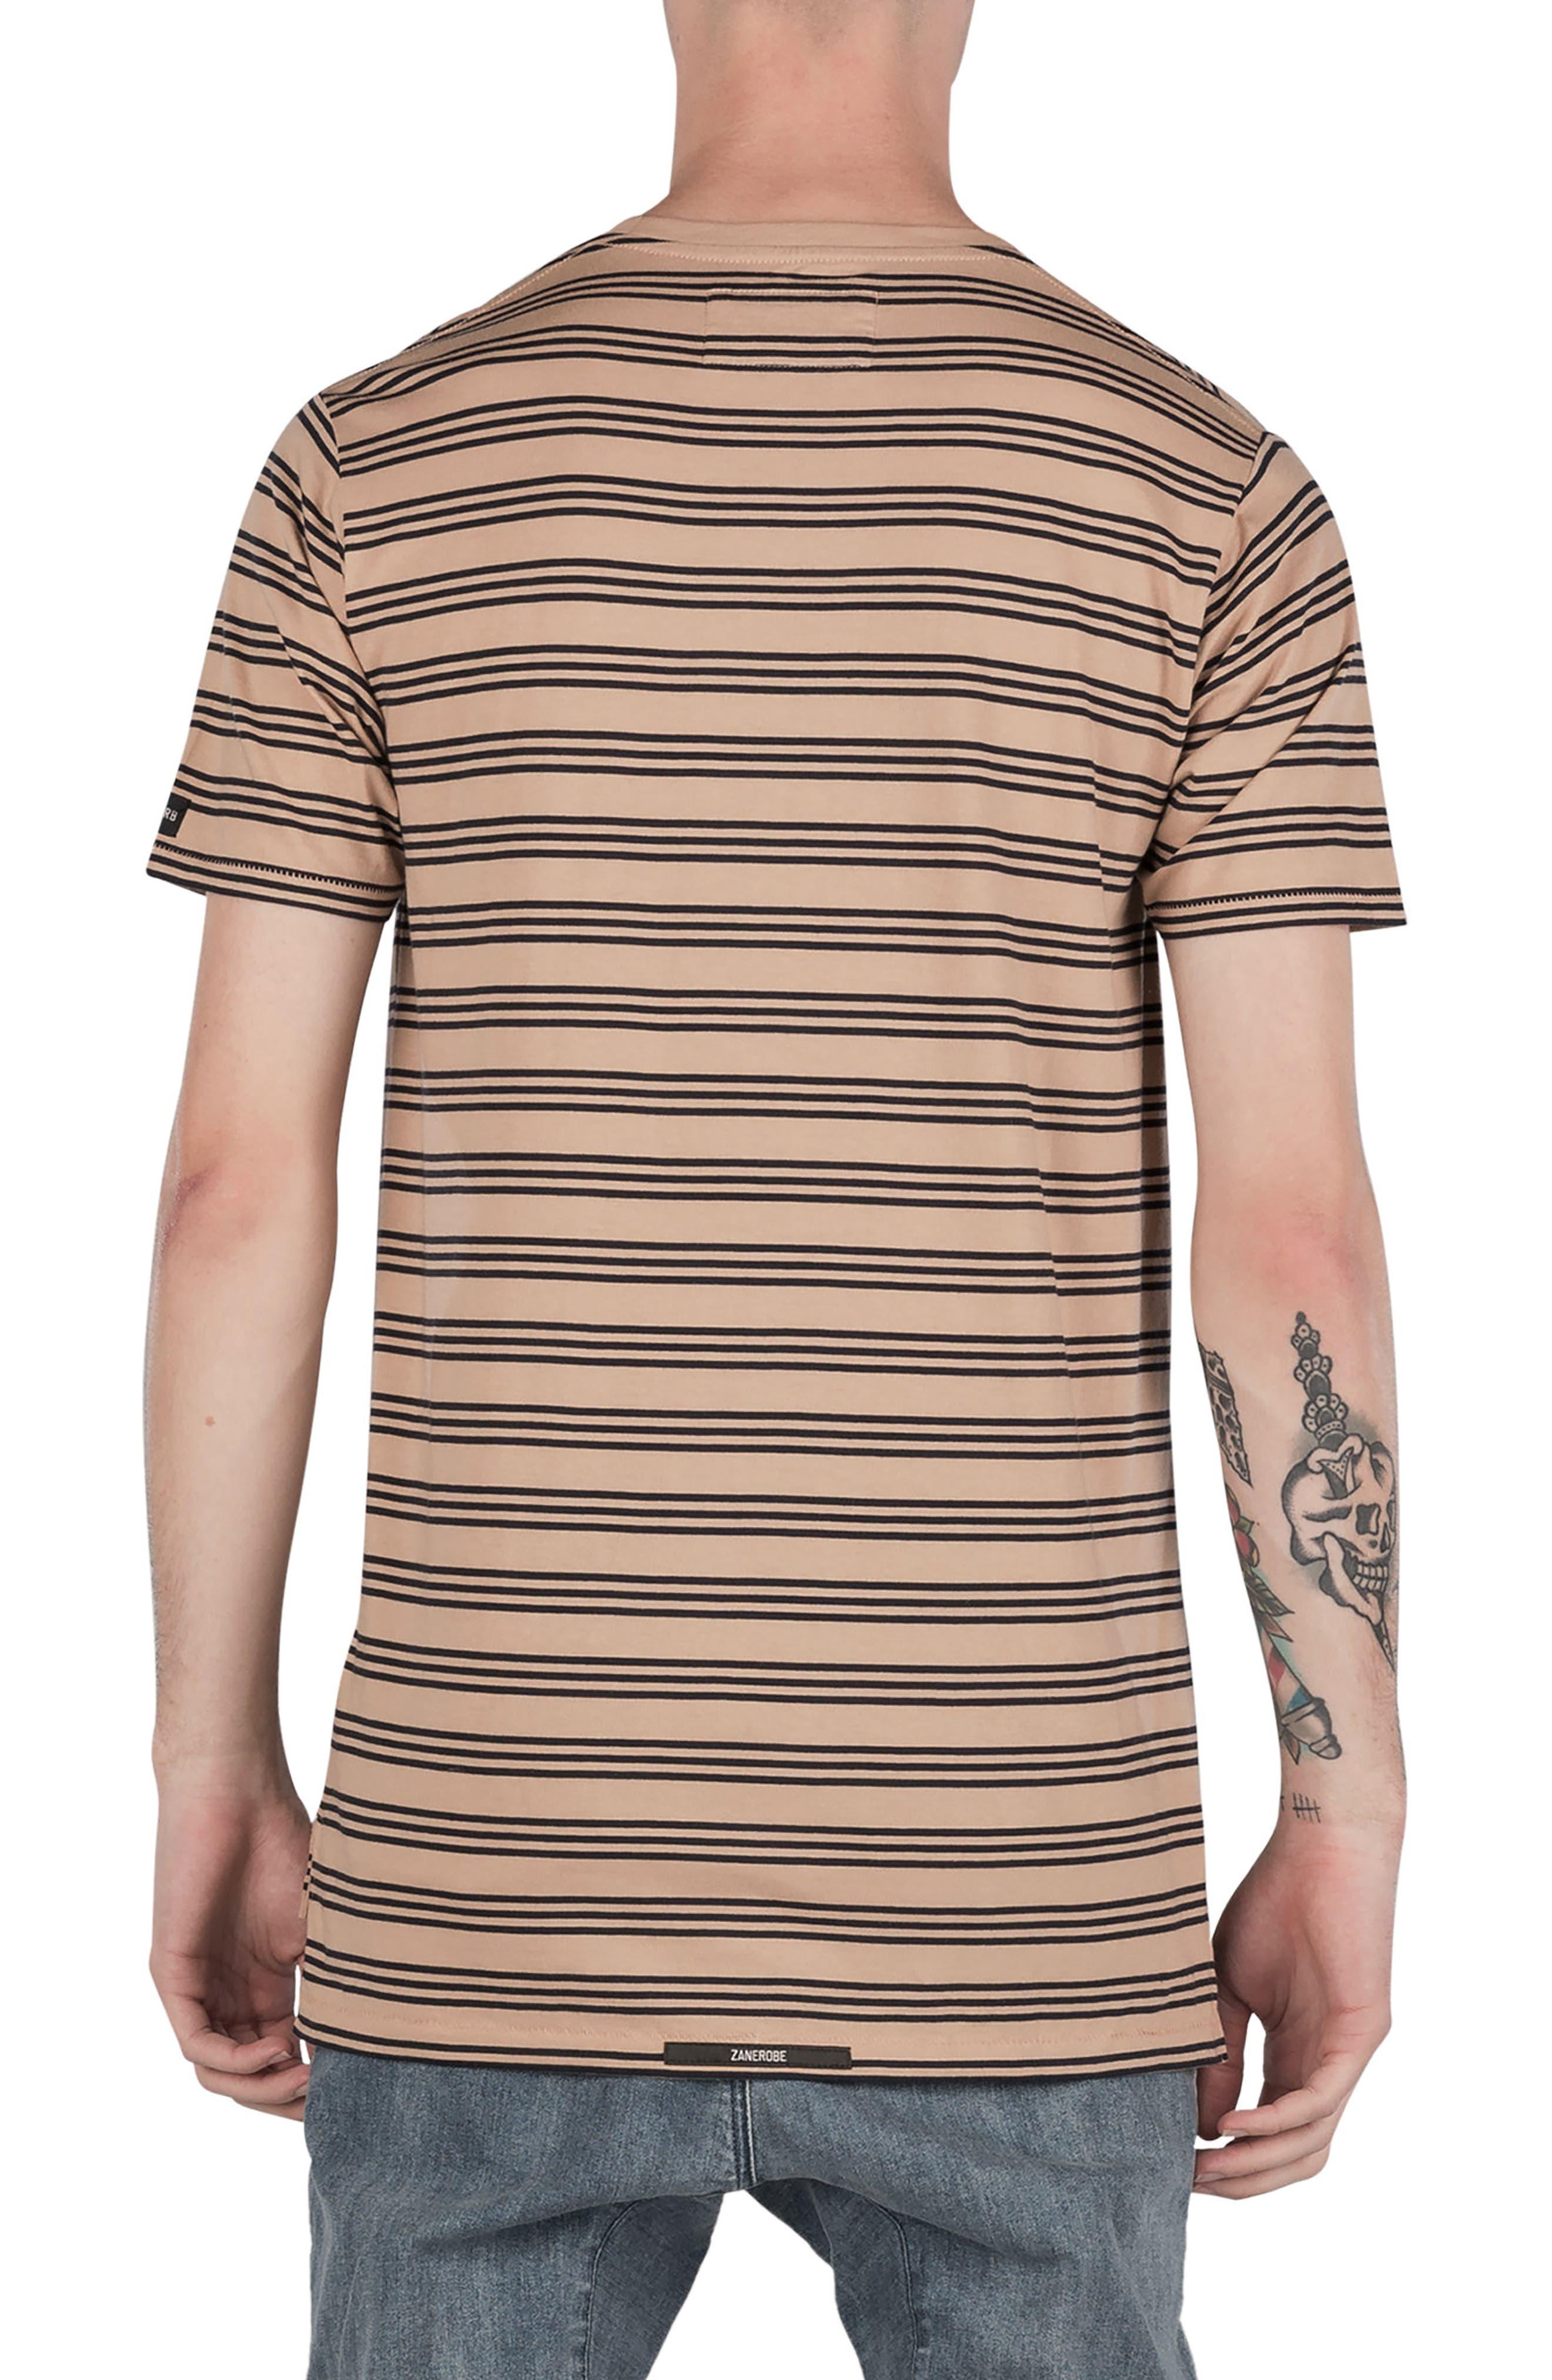 Flintlock Stripe T-Shirt,                             Alternate thumbnail 2, color,                             Wheat/ Navy